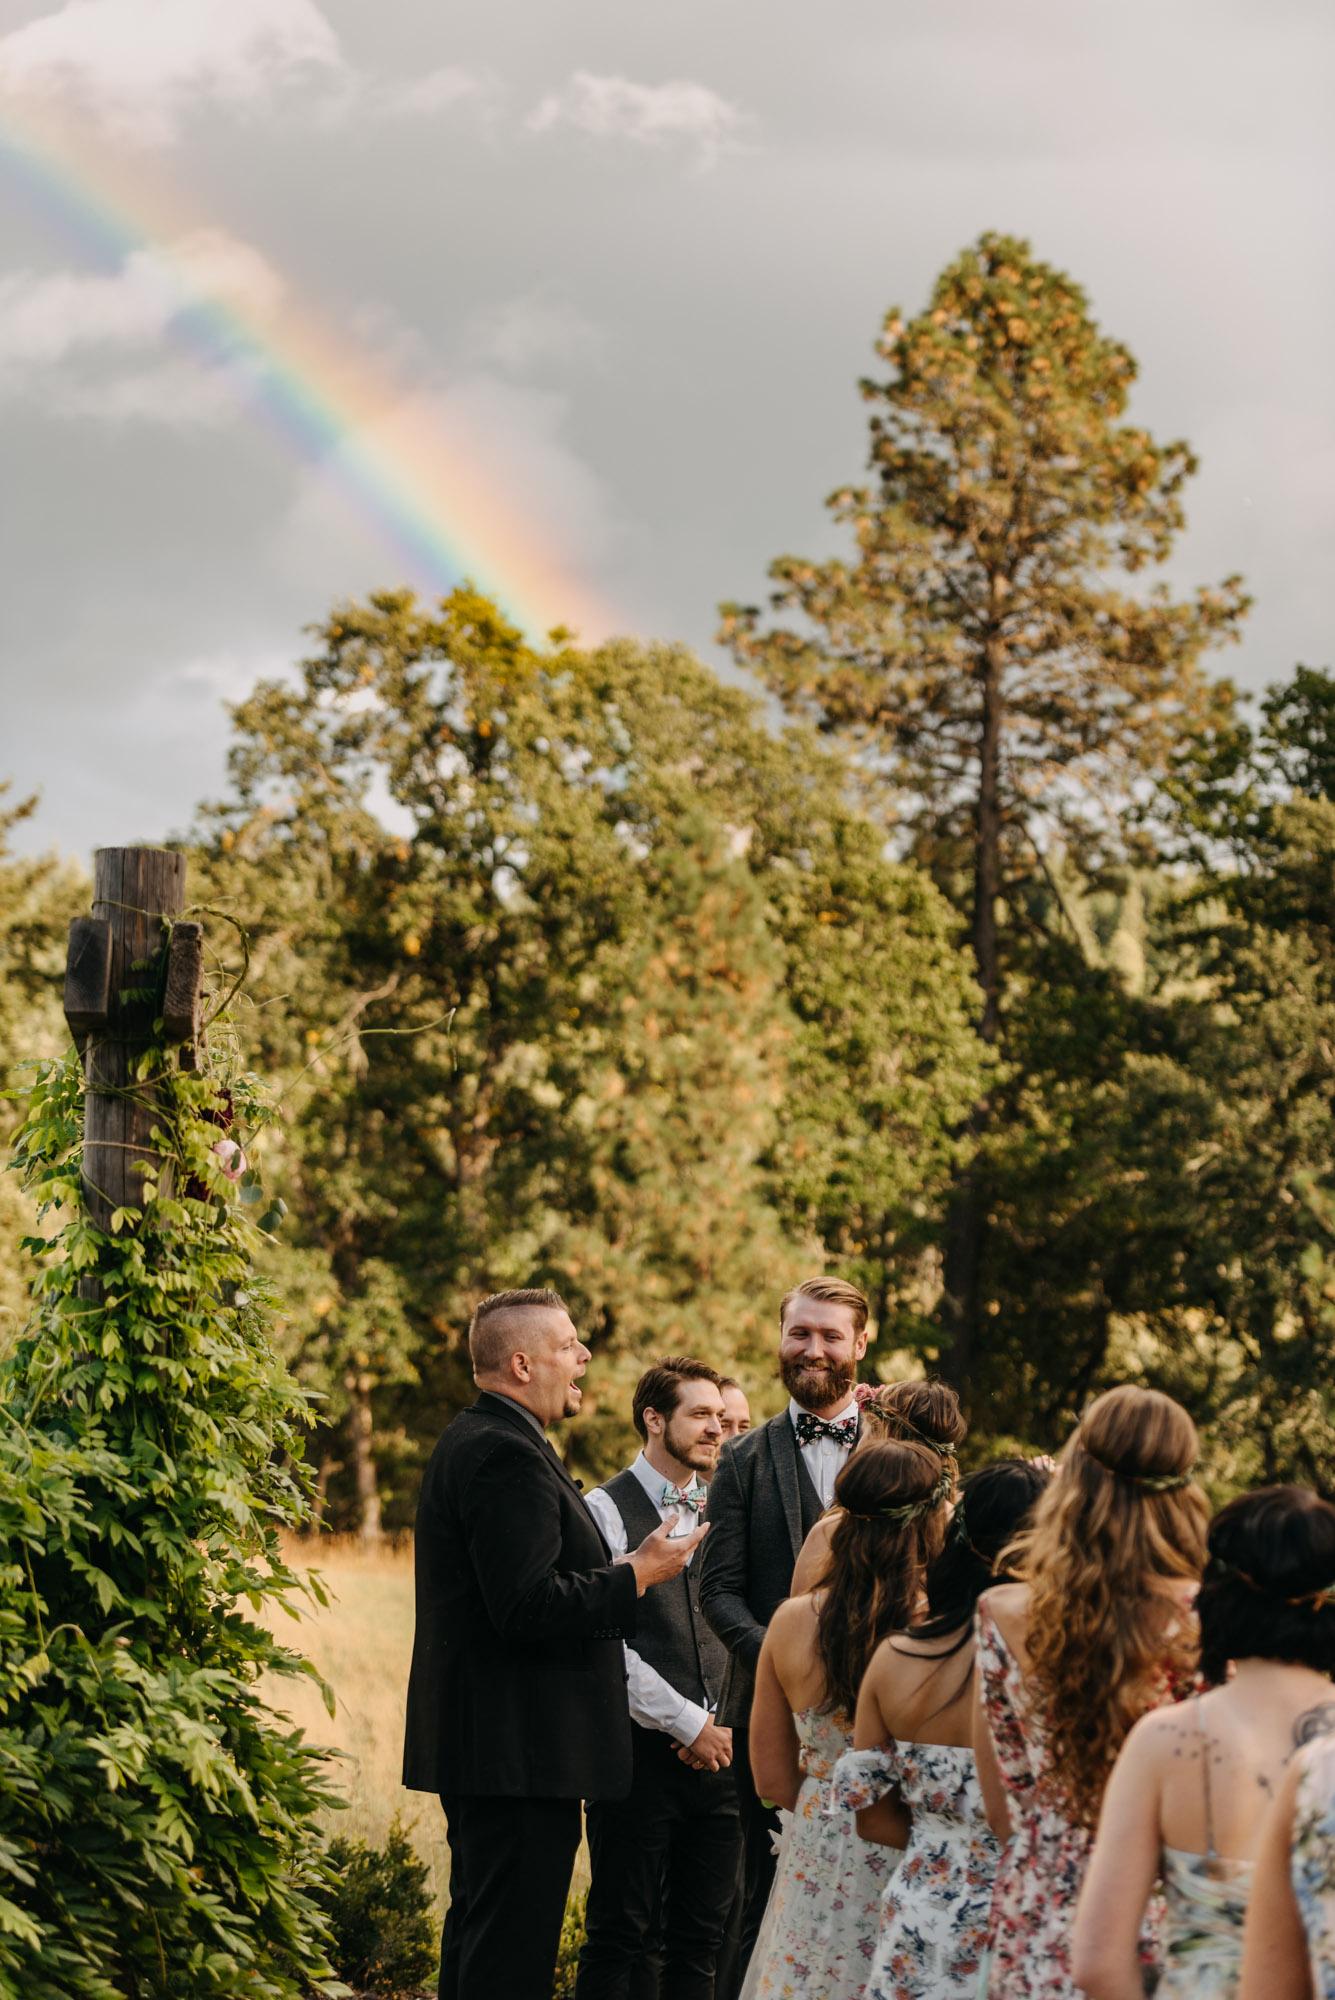 Outdoor-Summer-Ceremony-Washington-Wedding-Rainbow-8965.jpg